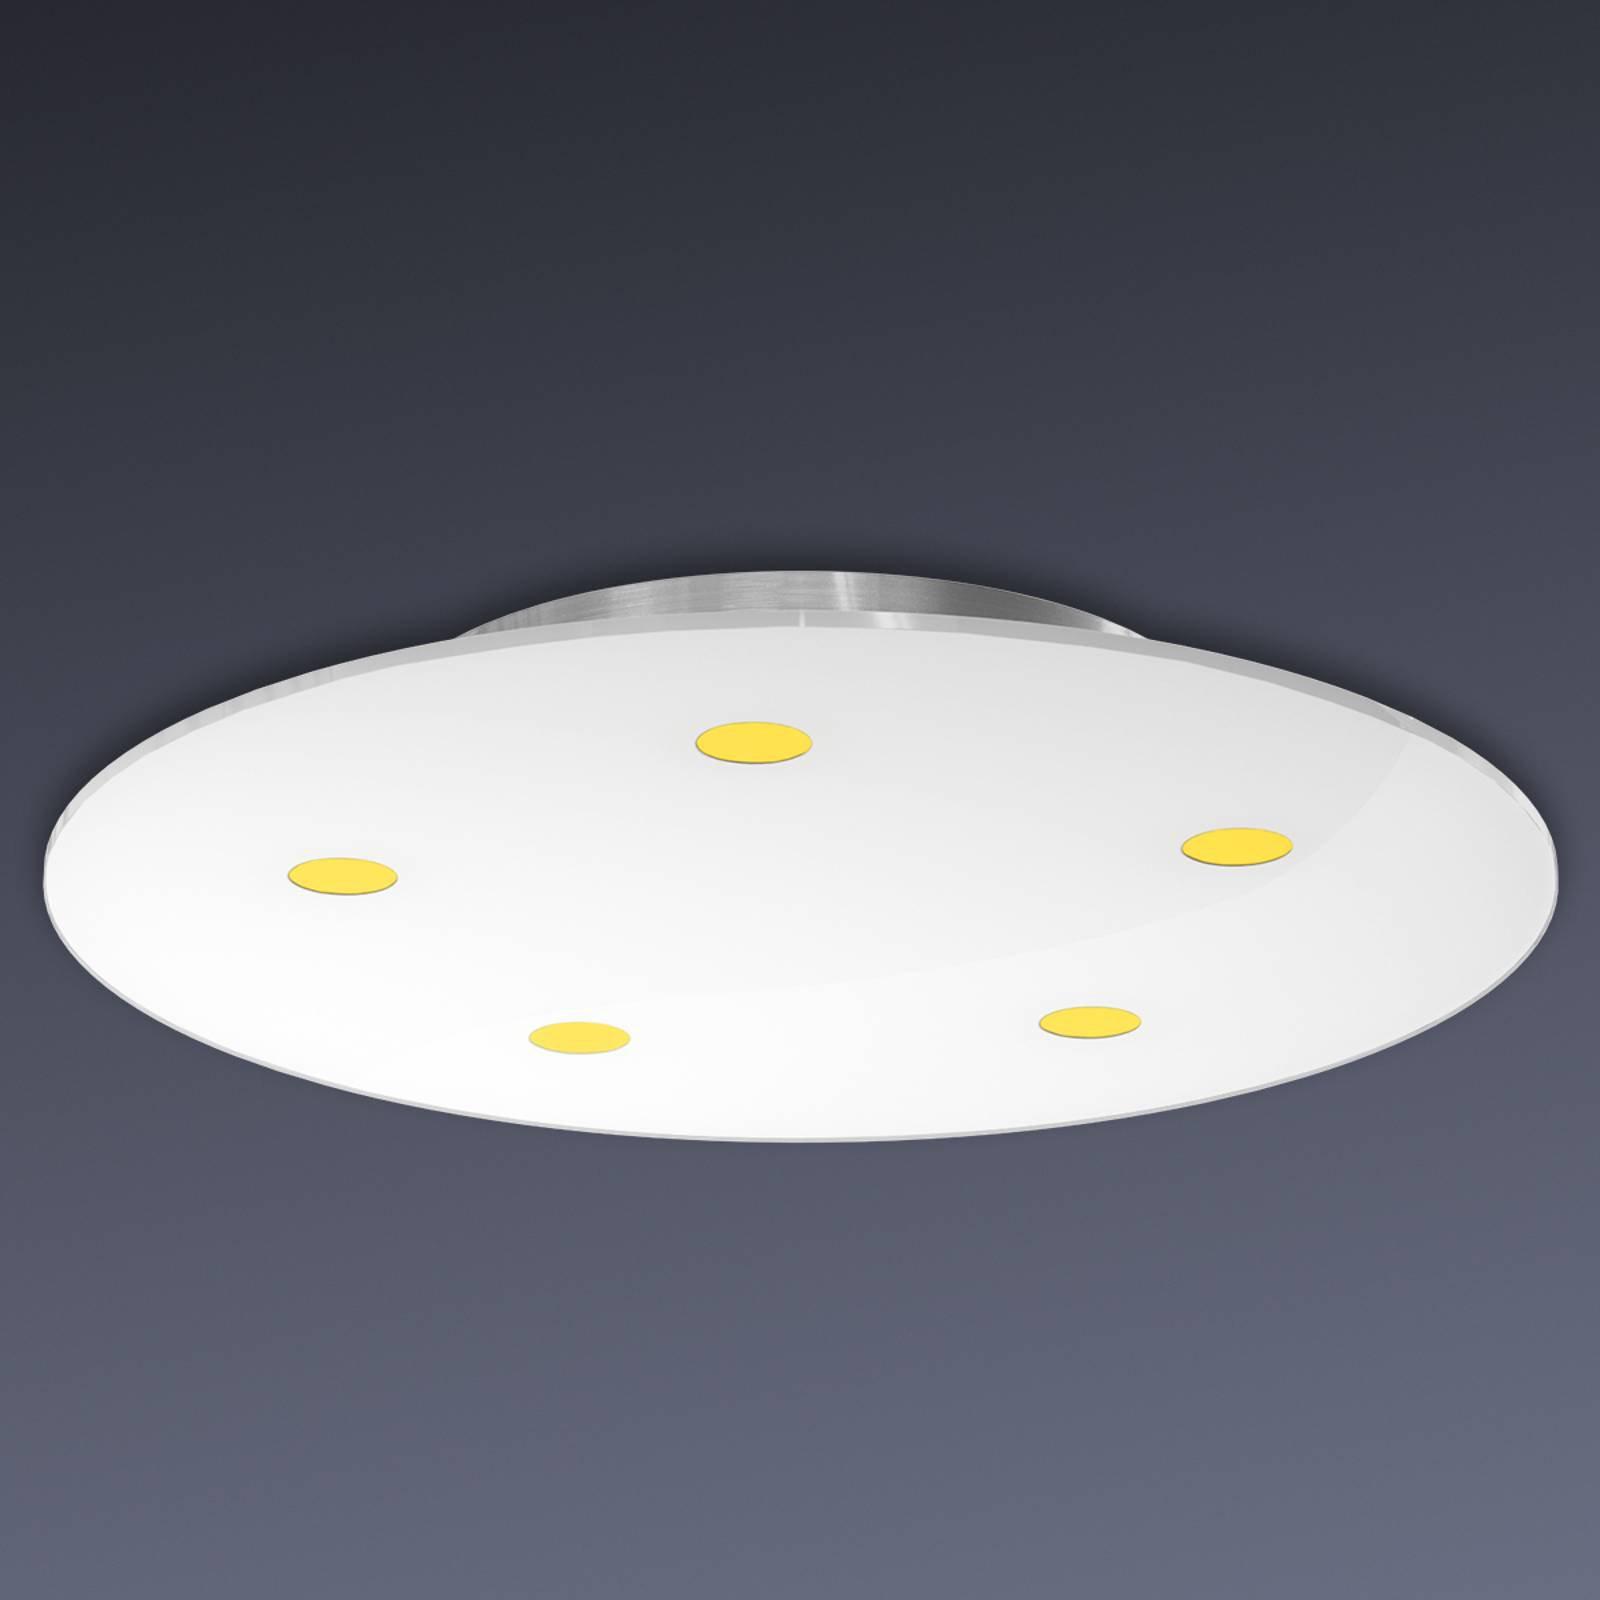 Dimbar taklampe Sunia med LED-lys